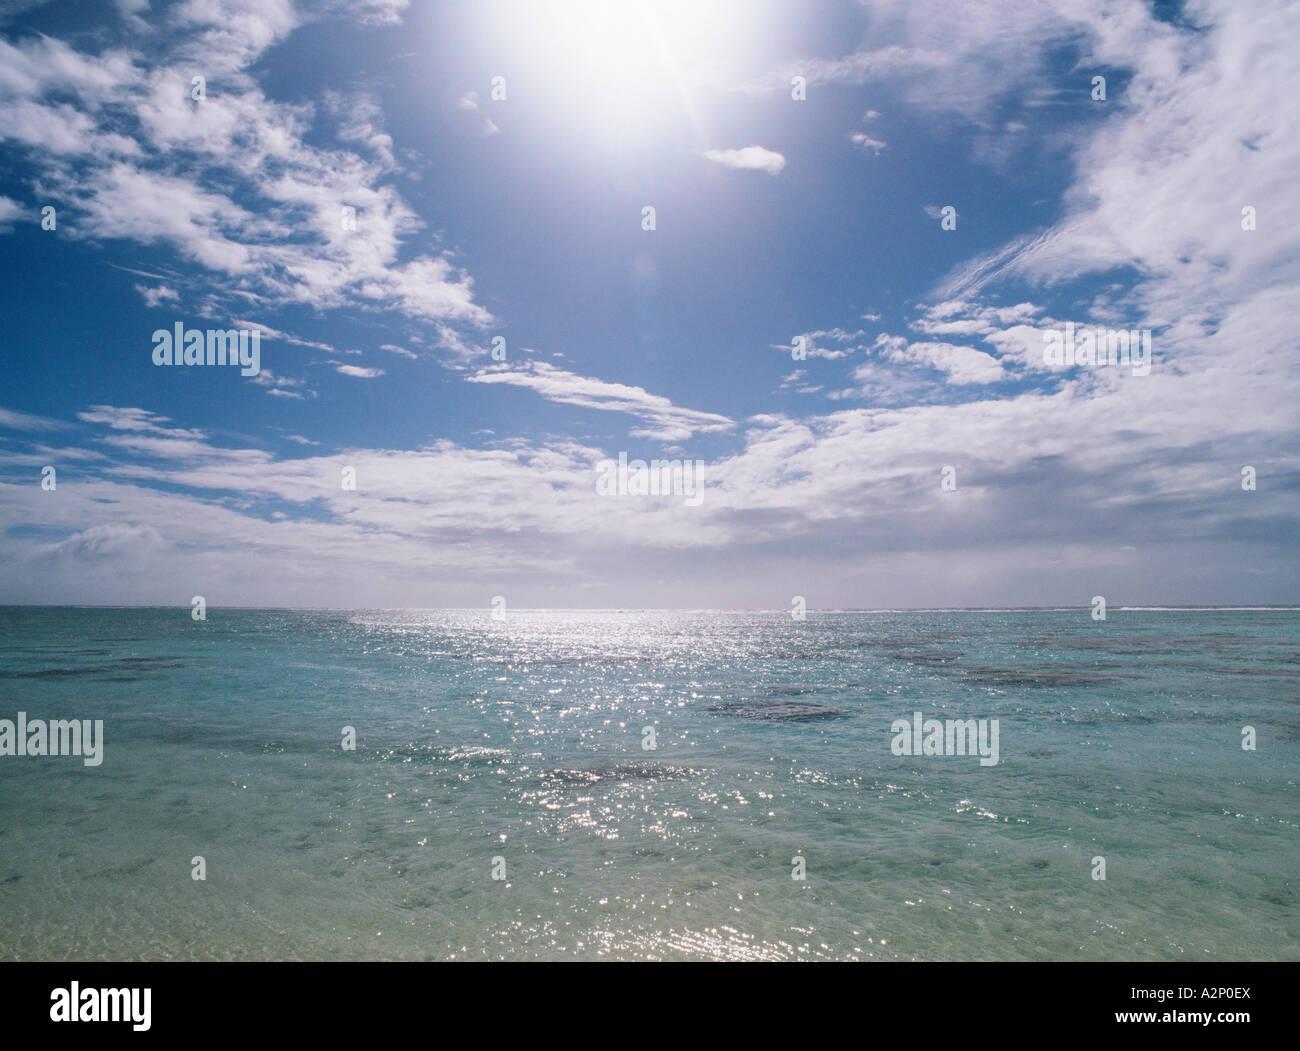 Sun shining on the sea - Stock Image